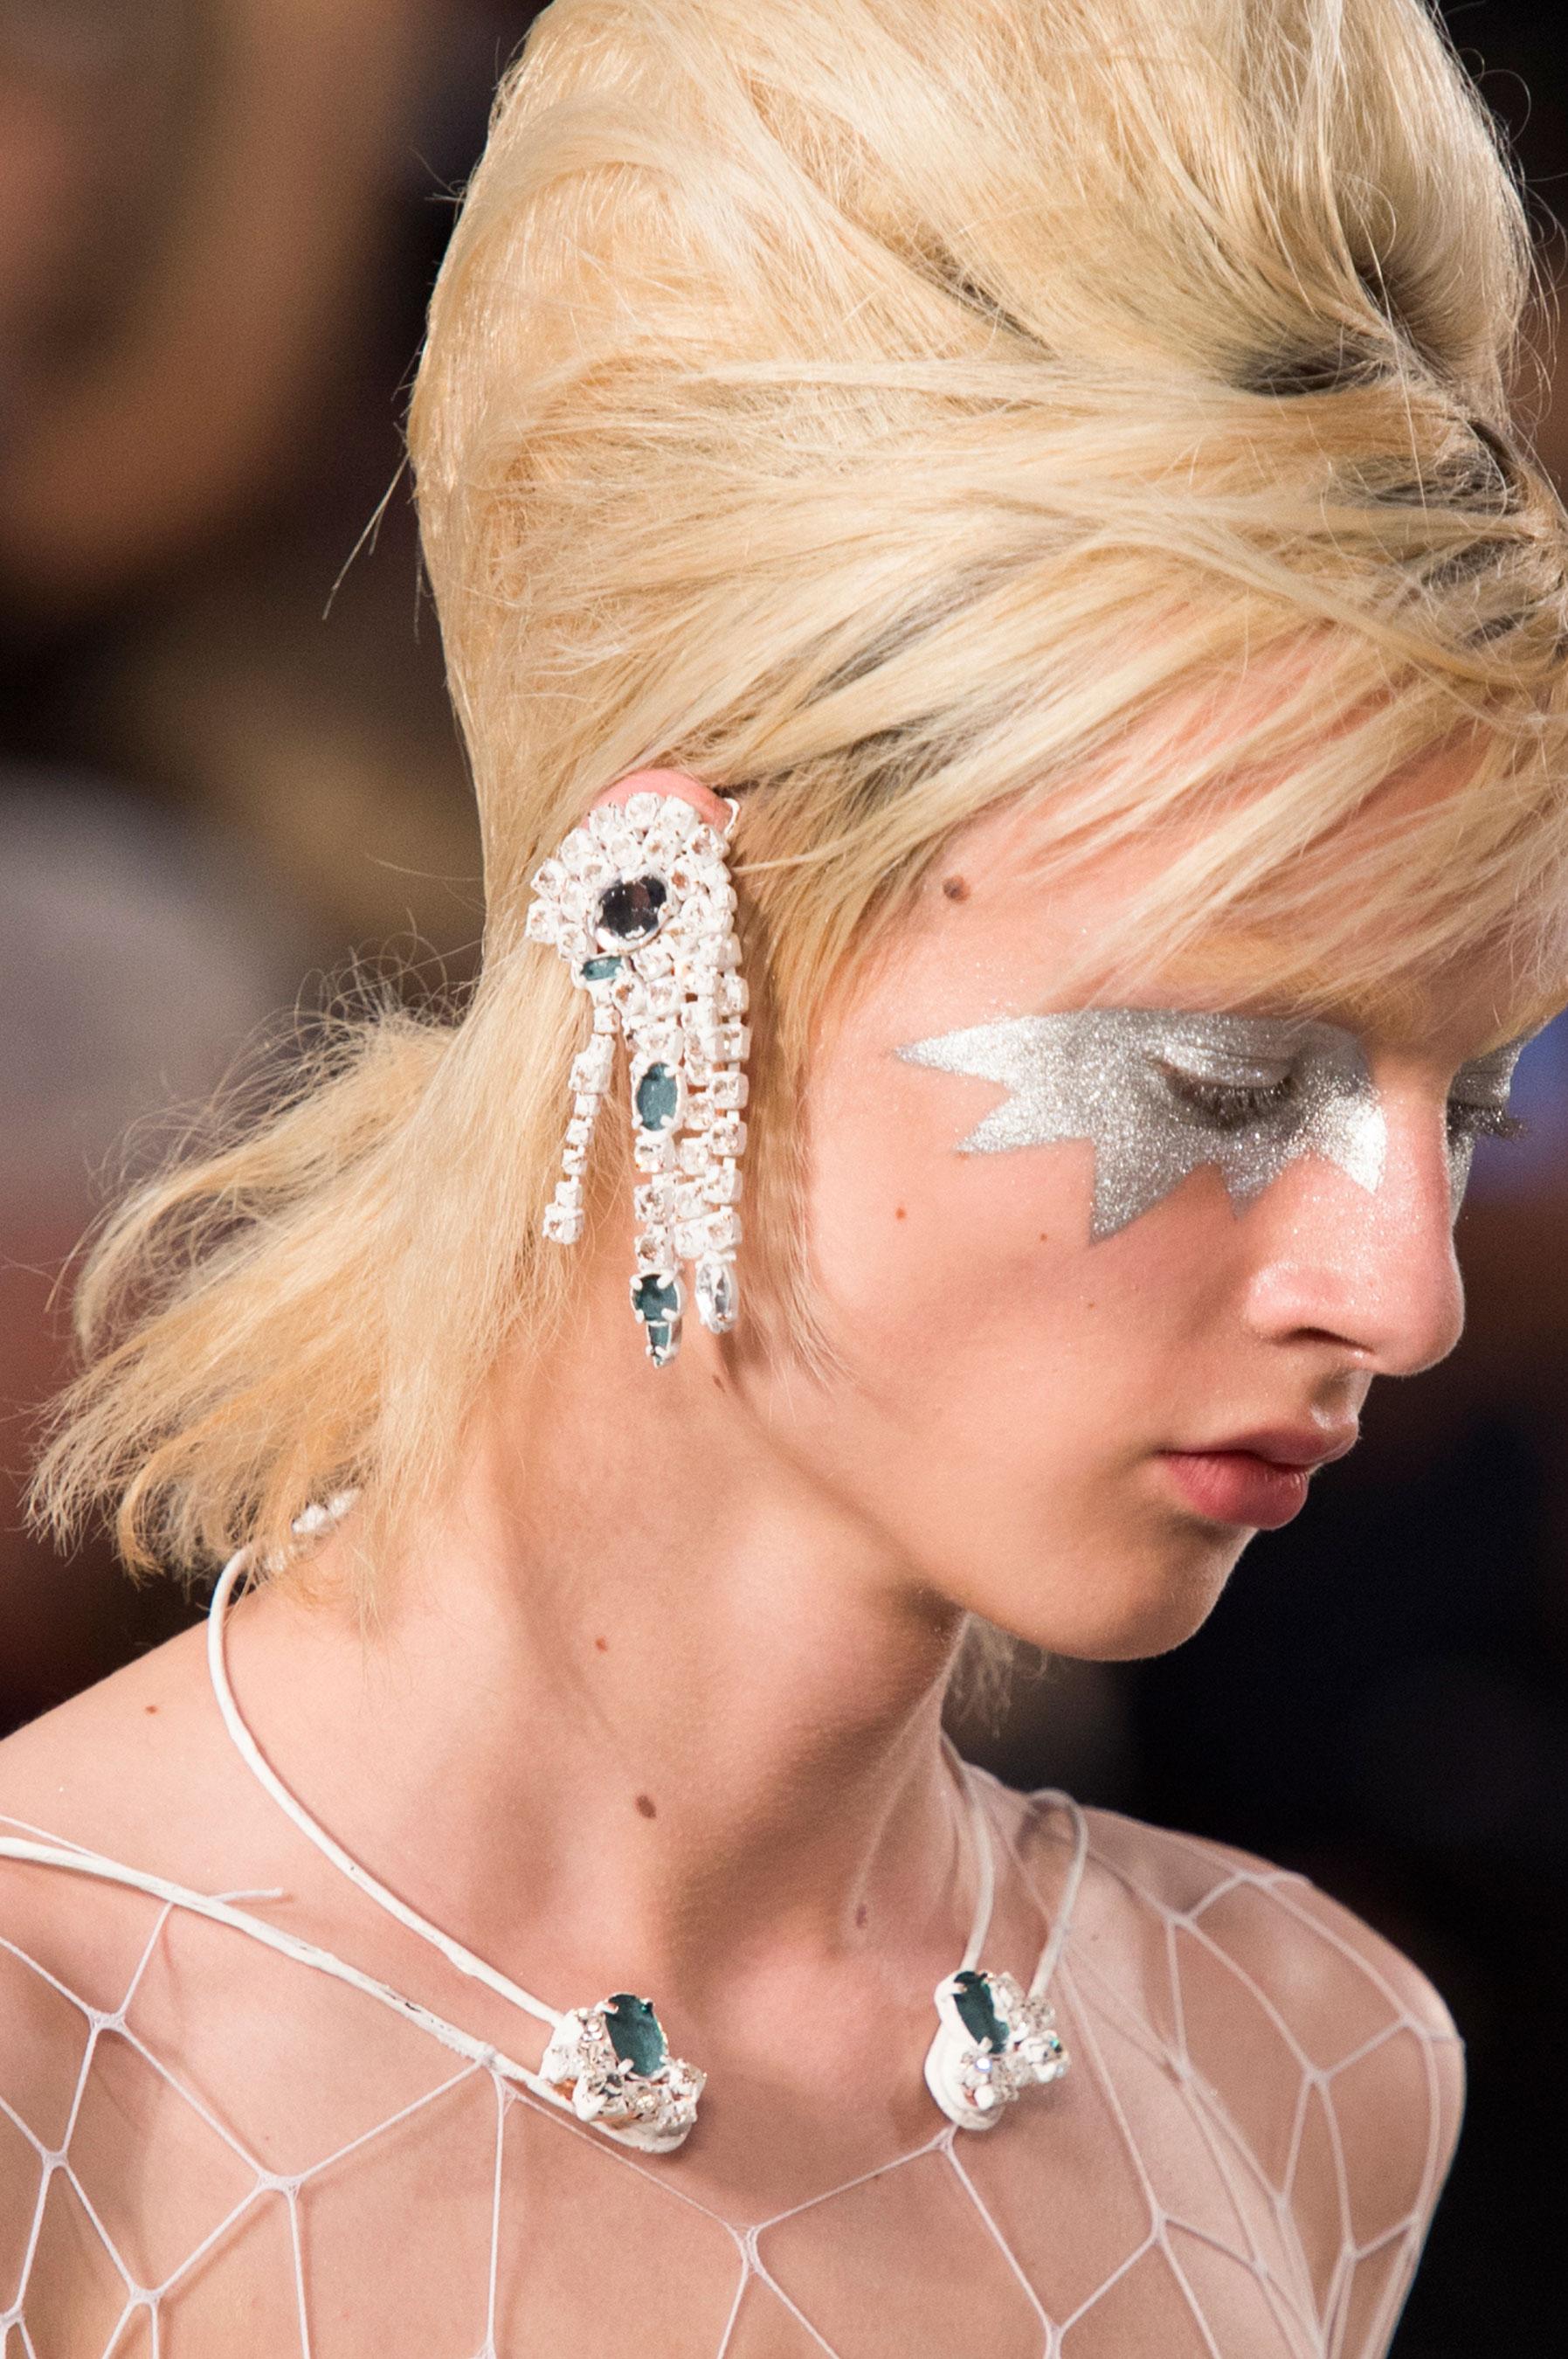 Maison-Margiela-spring-2016-runway-beauty-fashion-show-the-impression-072